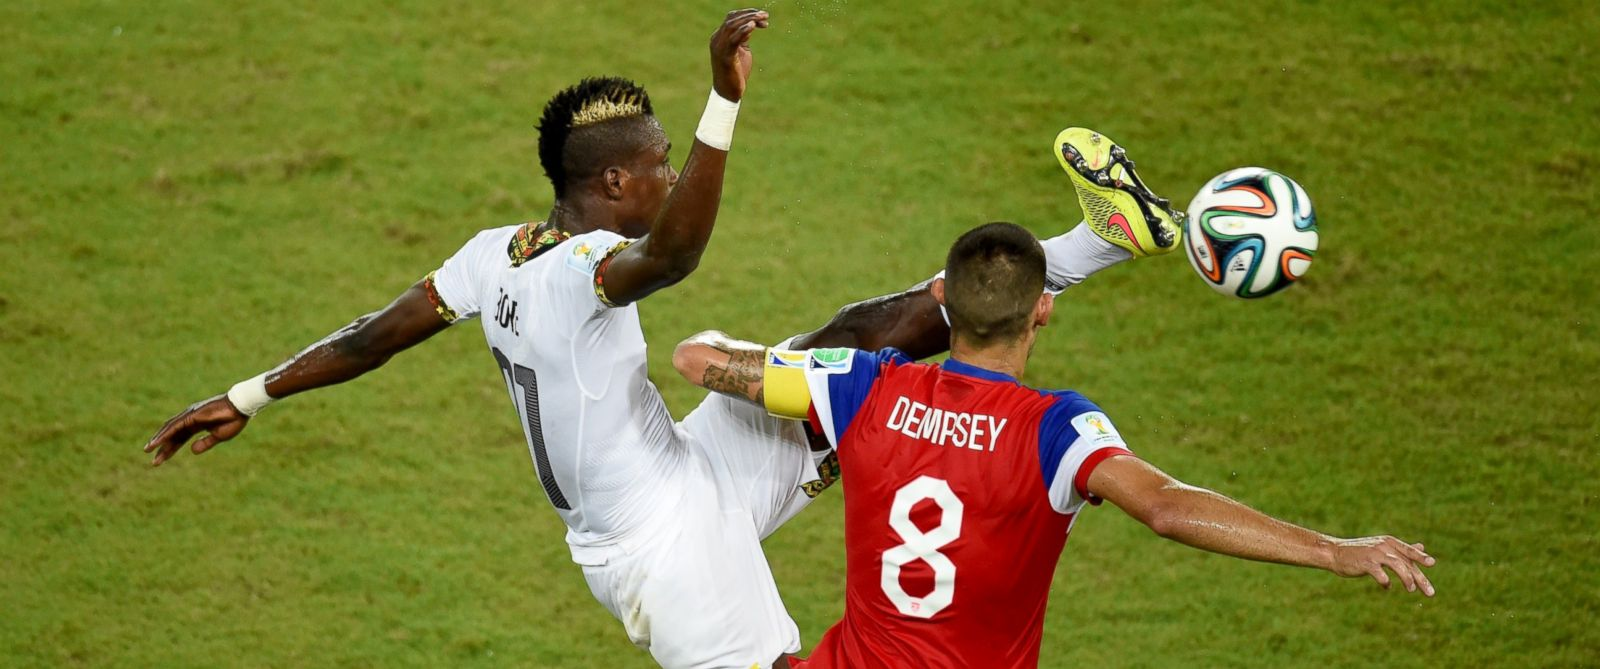 PHOTO: 2014 FIFA World Cup